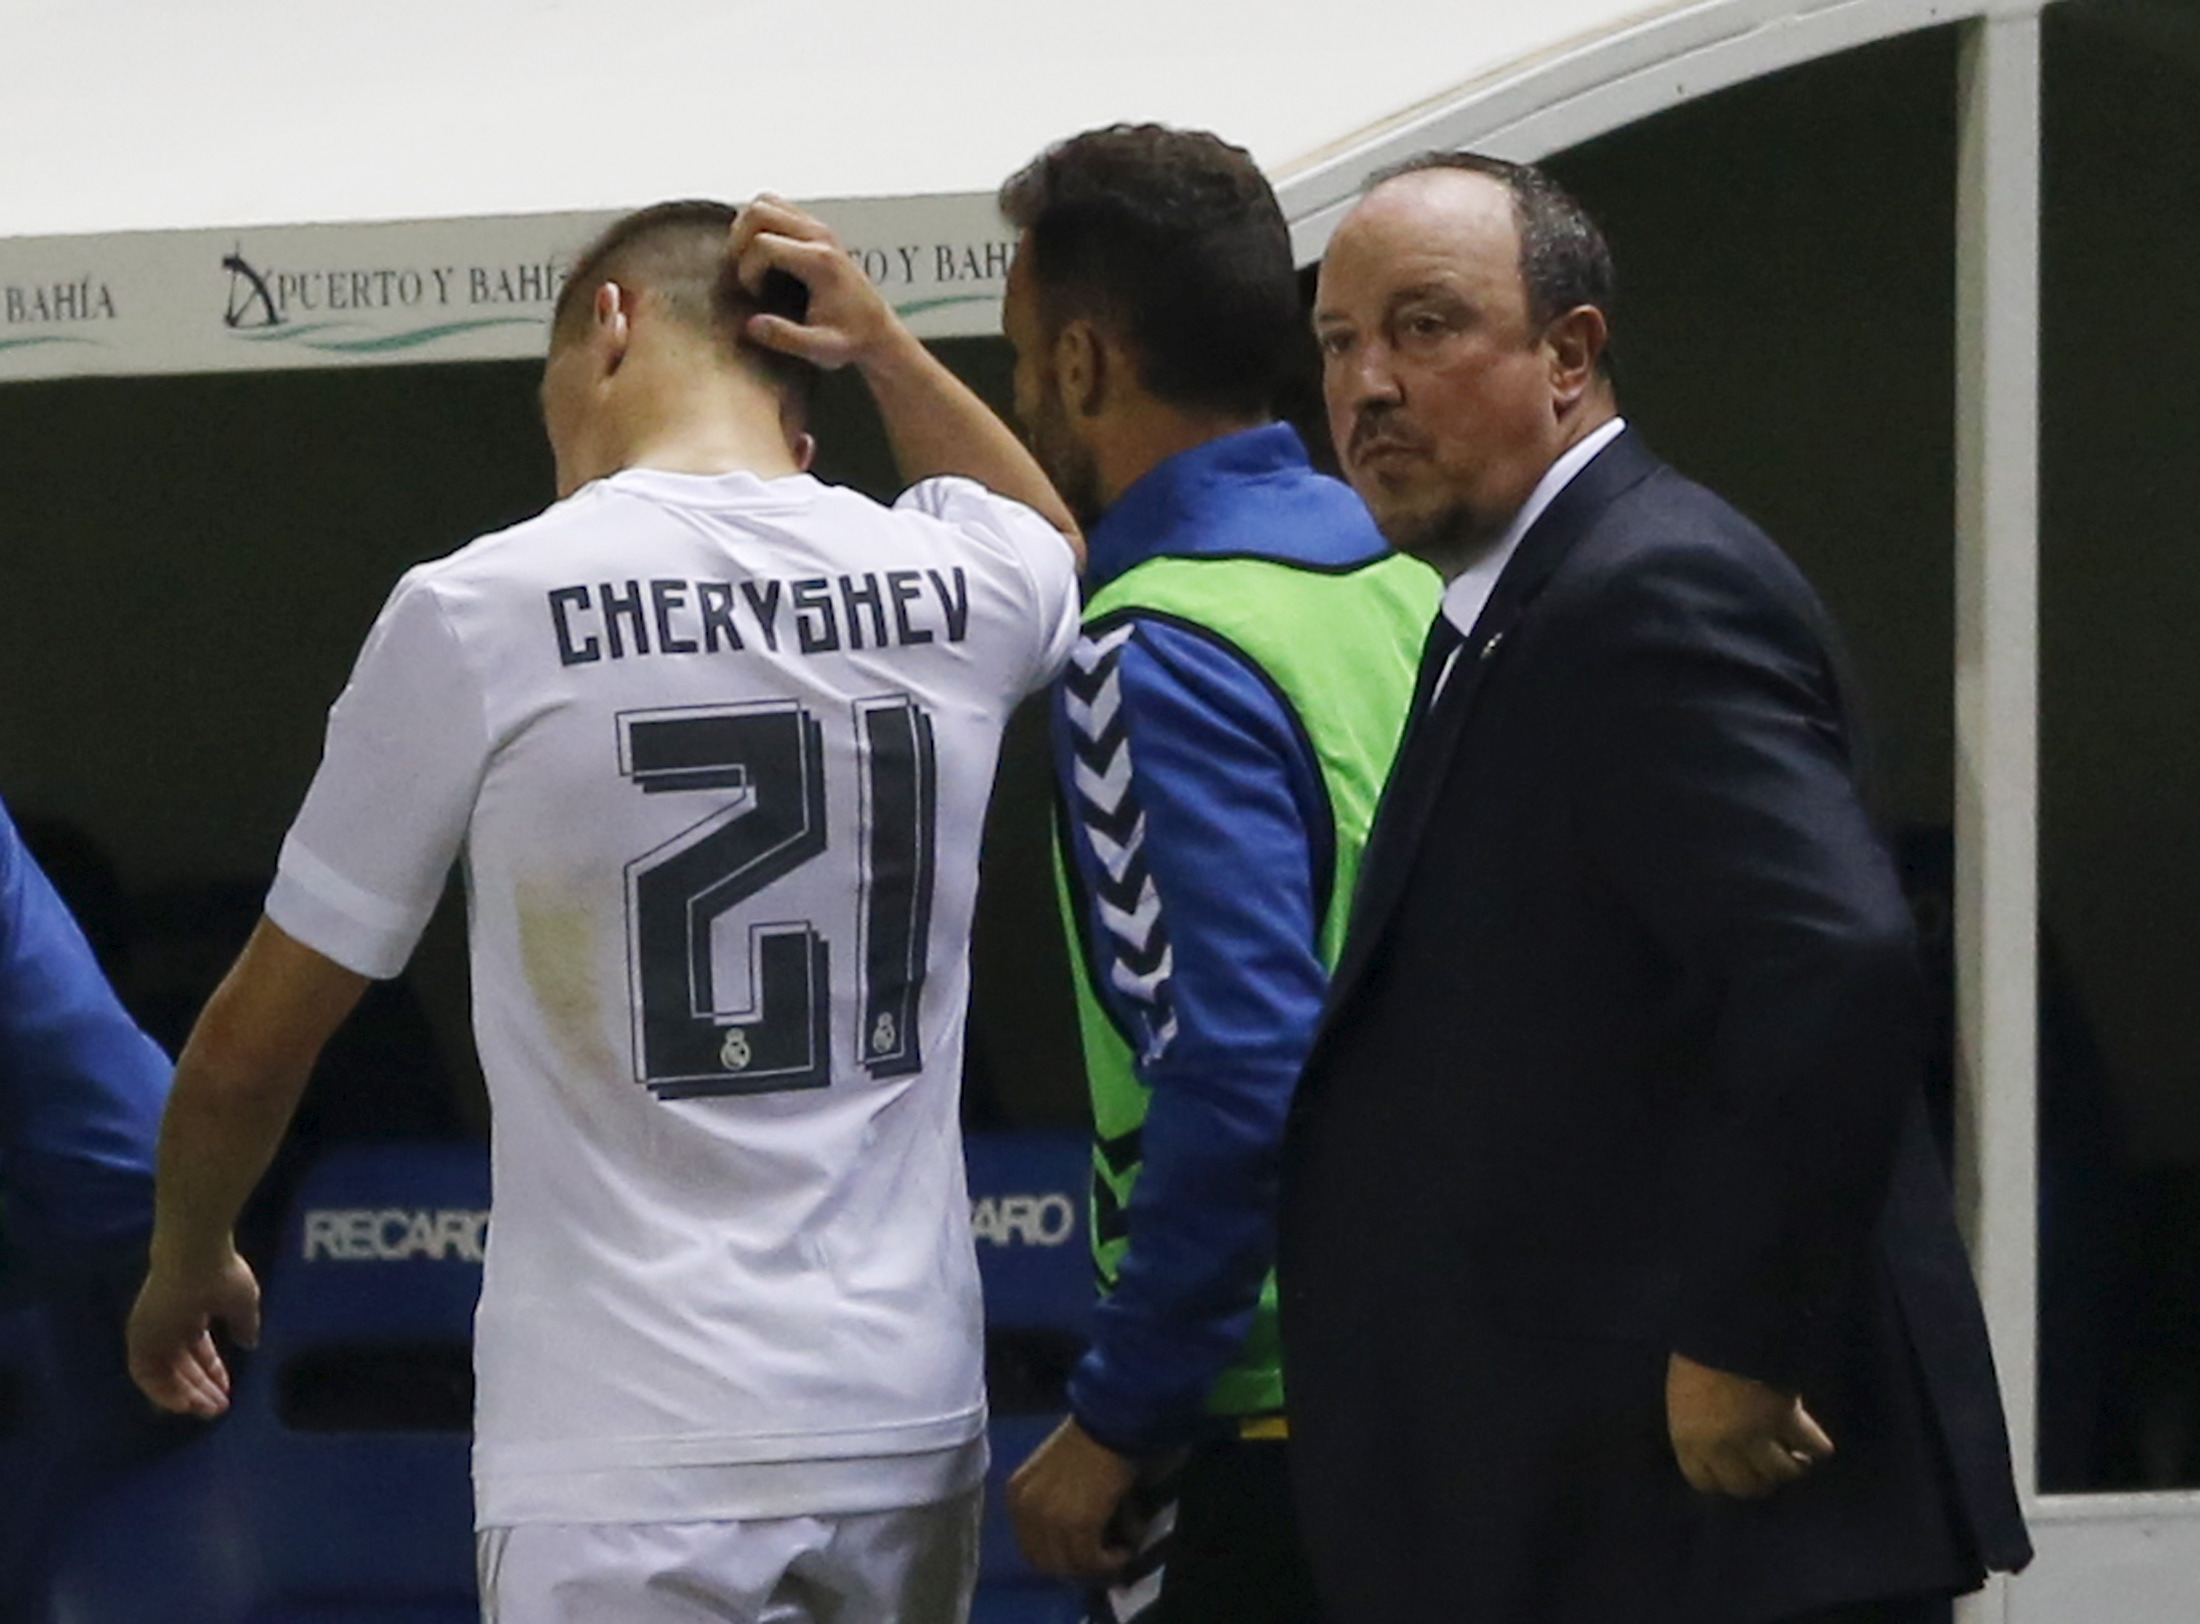 Rafael Benitez y Cherishev. Reuters